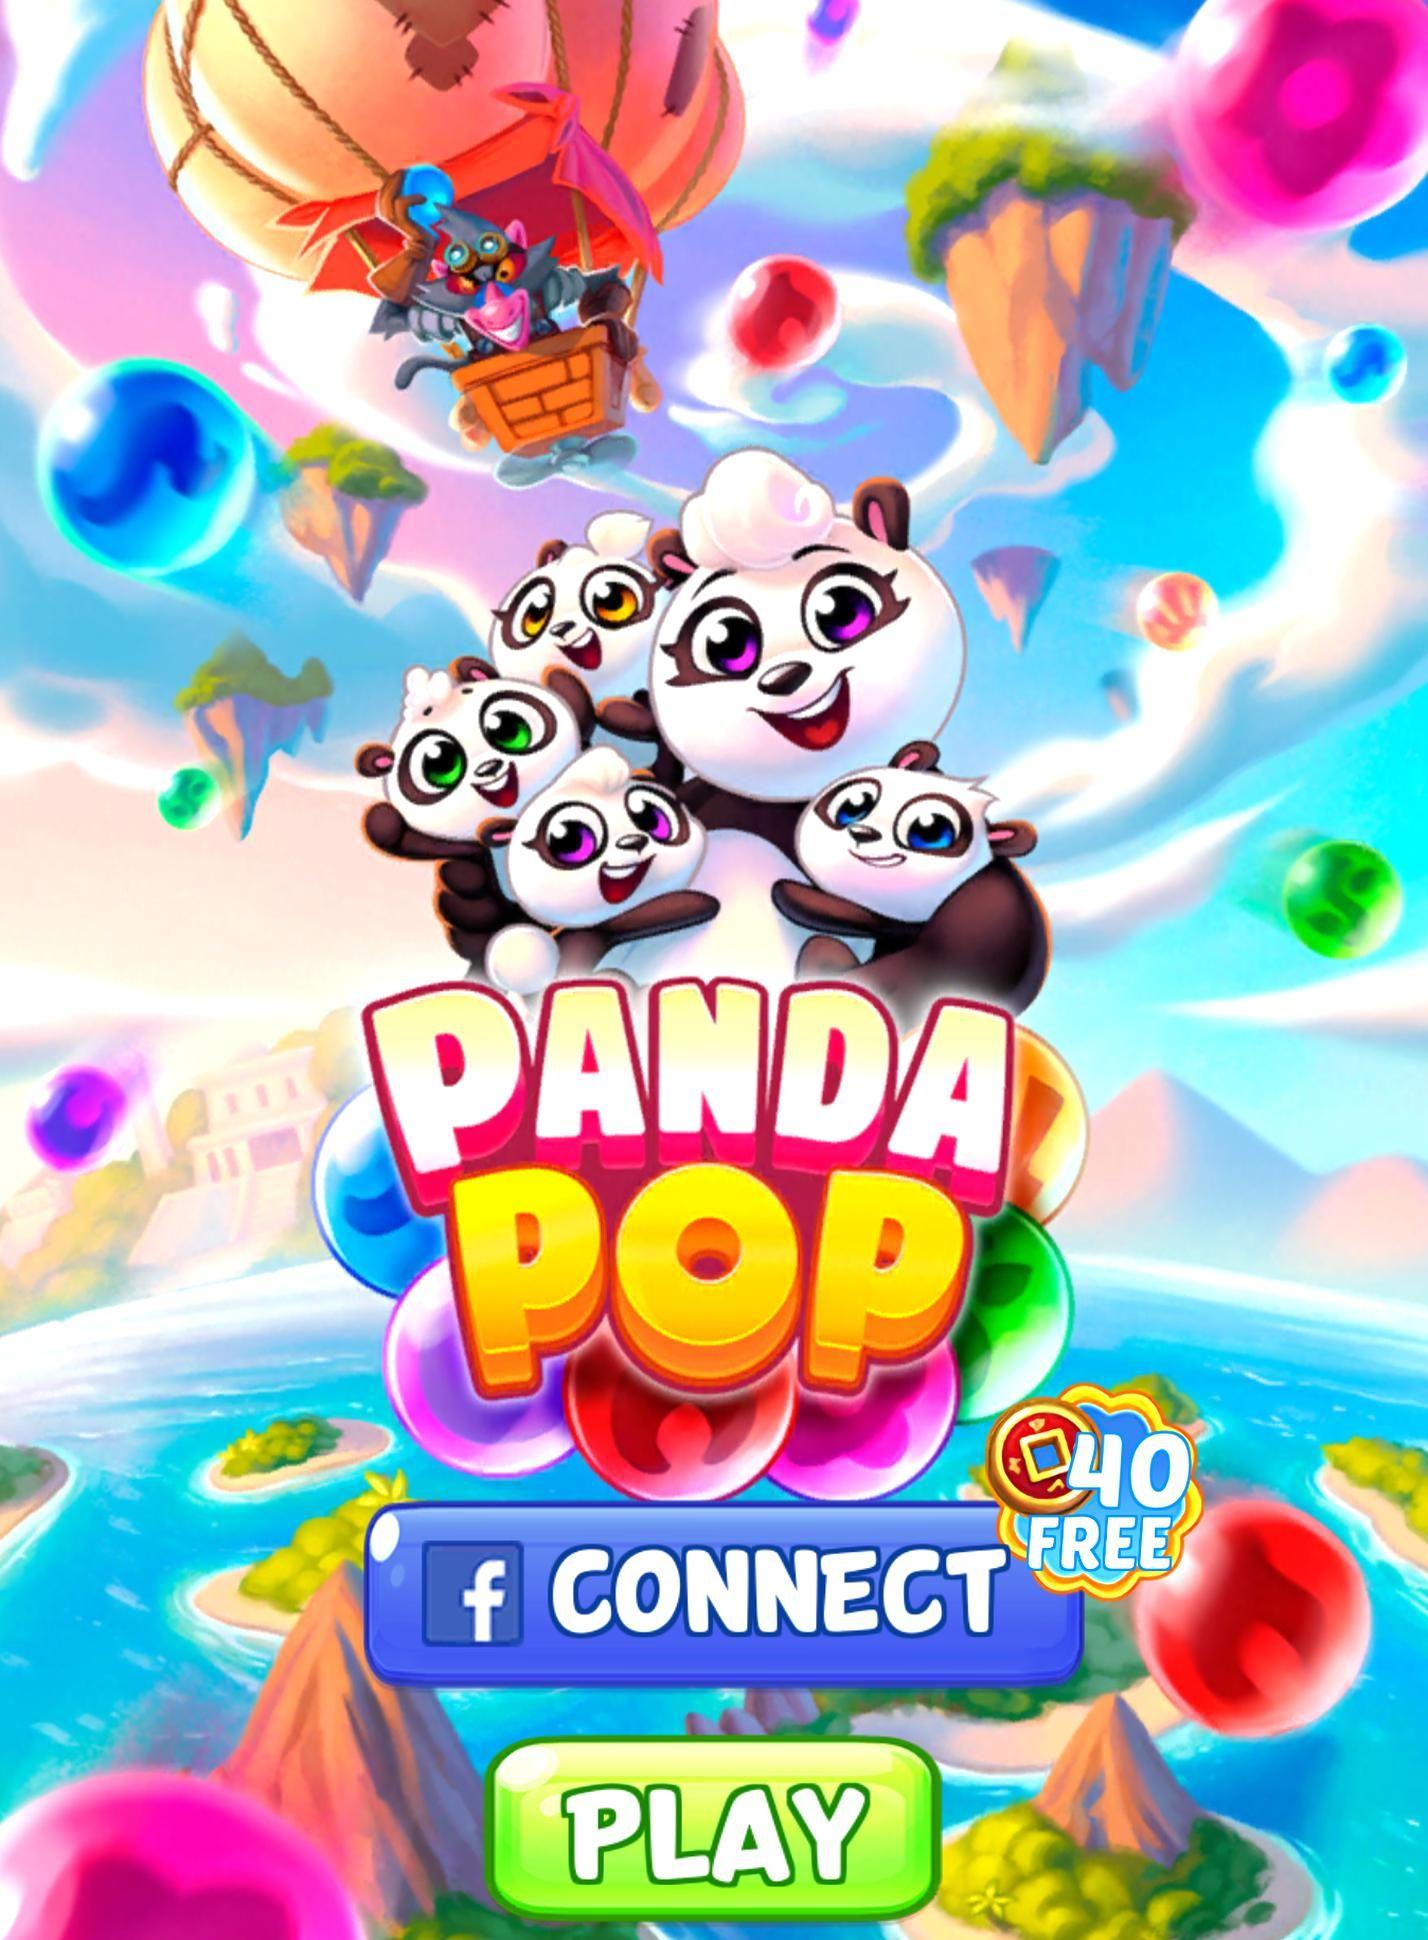 Mobile game app store splash screen design in 2020